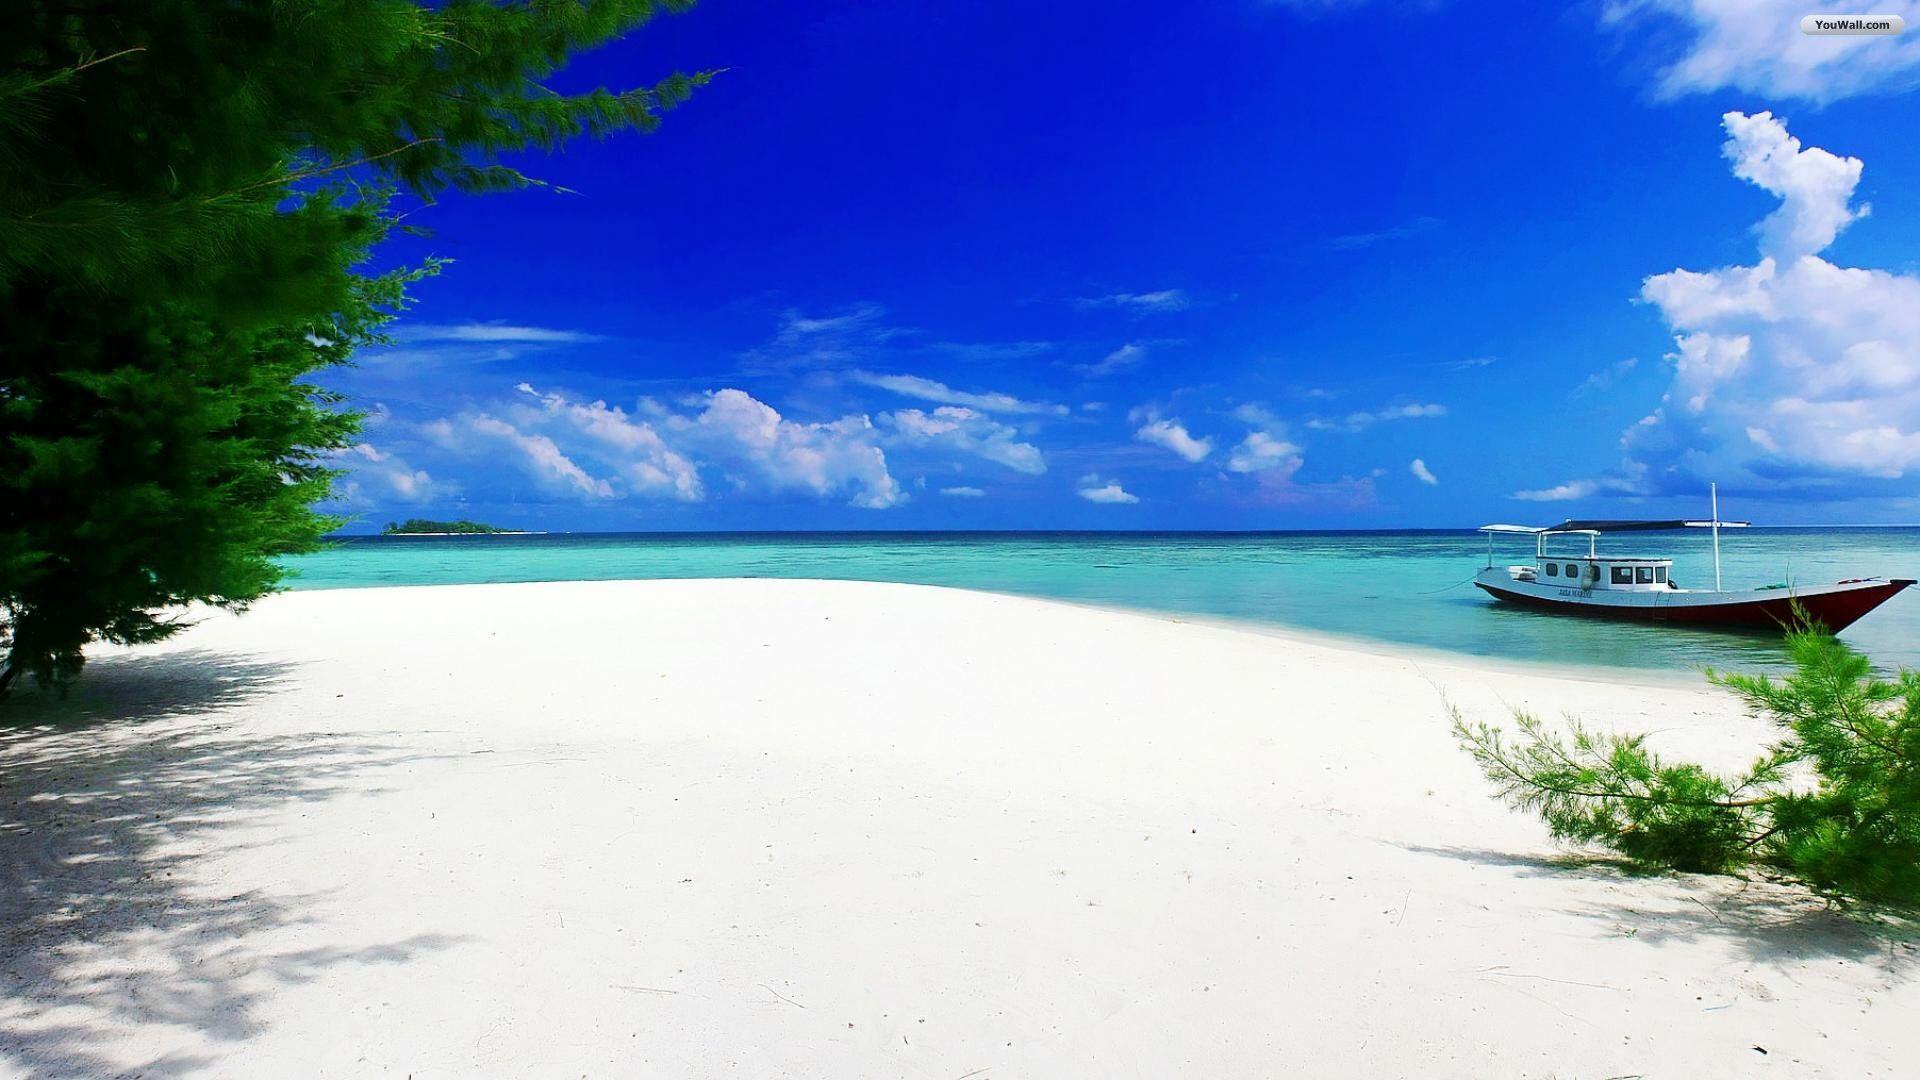 Indonesia Beach Wallpaper Most Beautiful Beaches Beautiful Beaches Beach